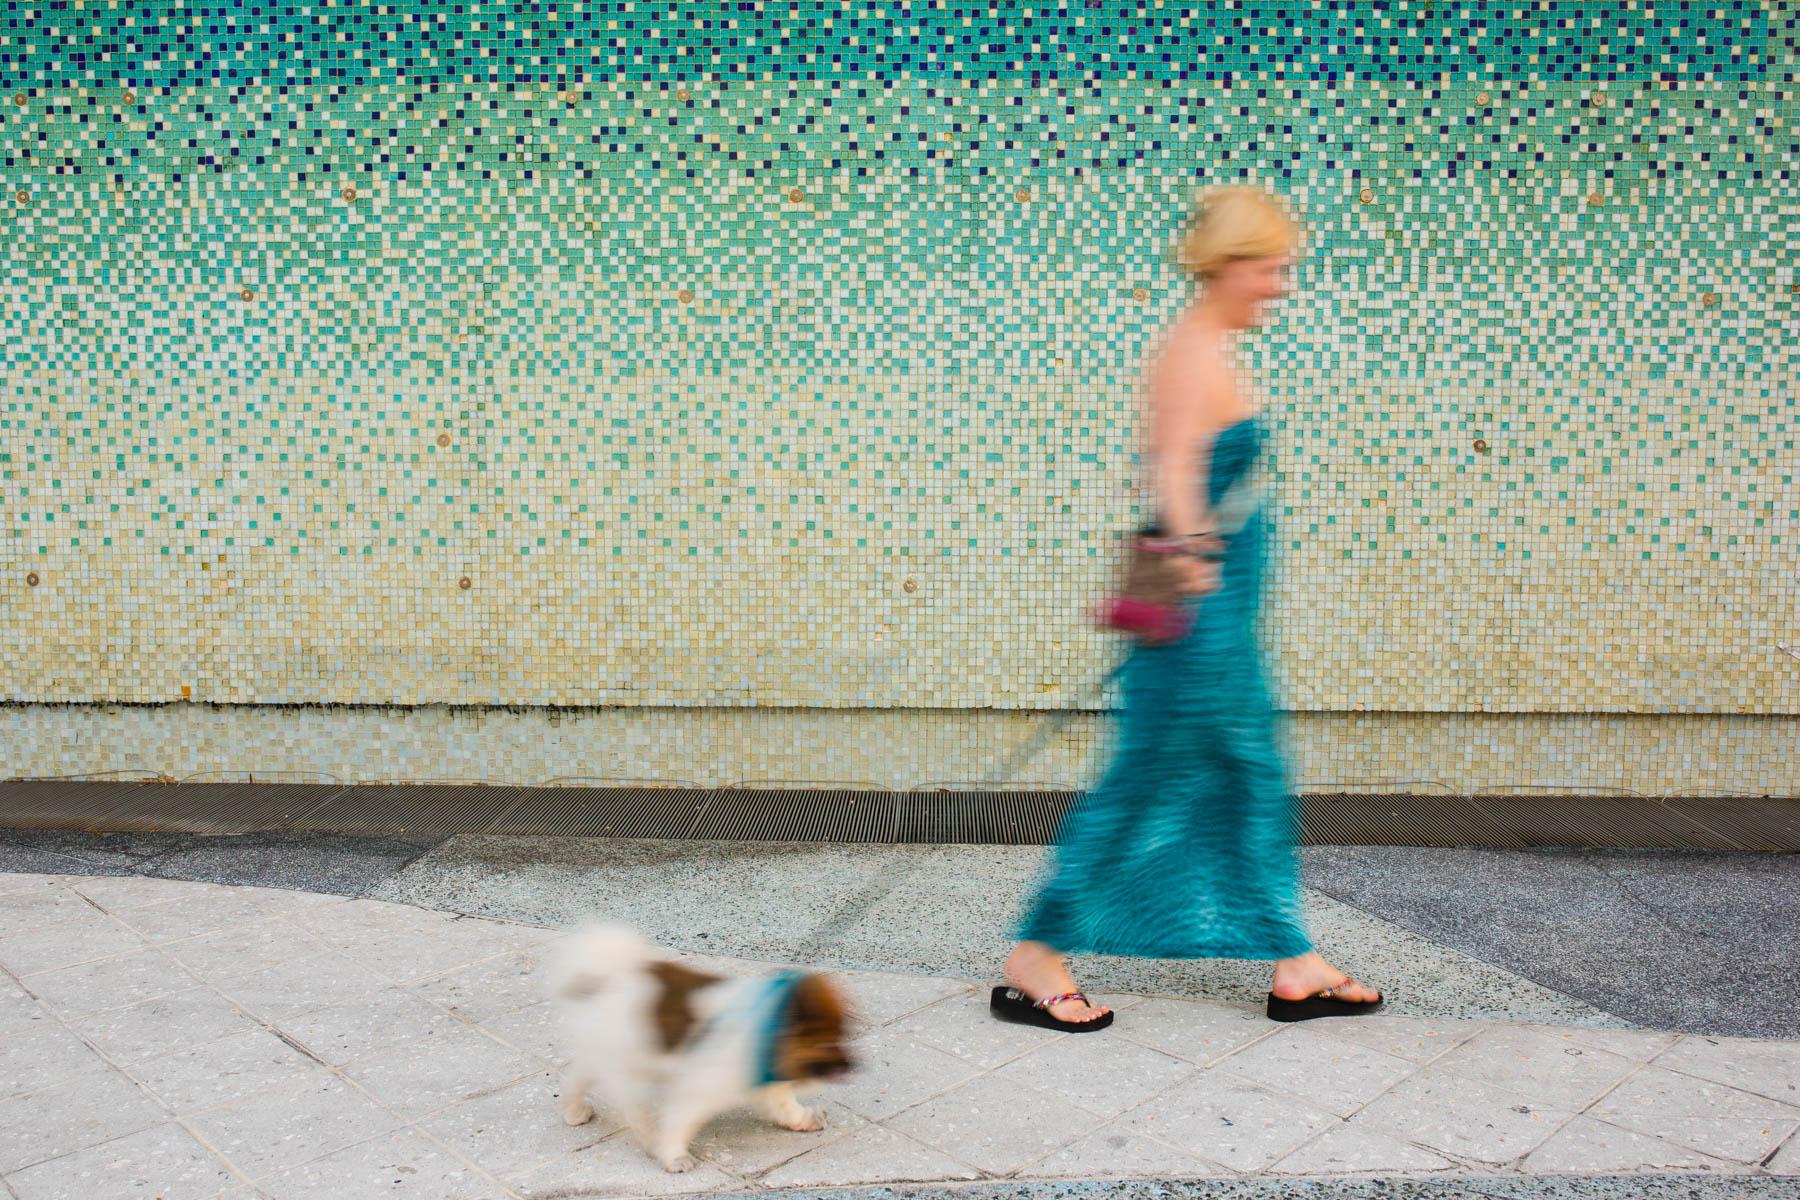 Miami_4x6_ATarr-5550.jpg